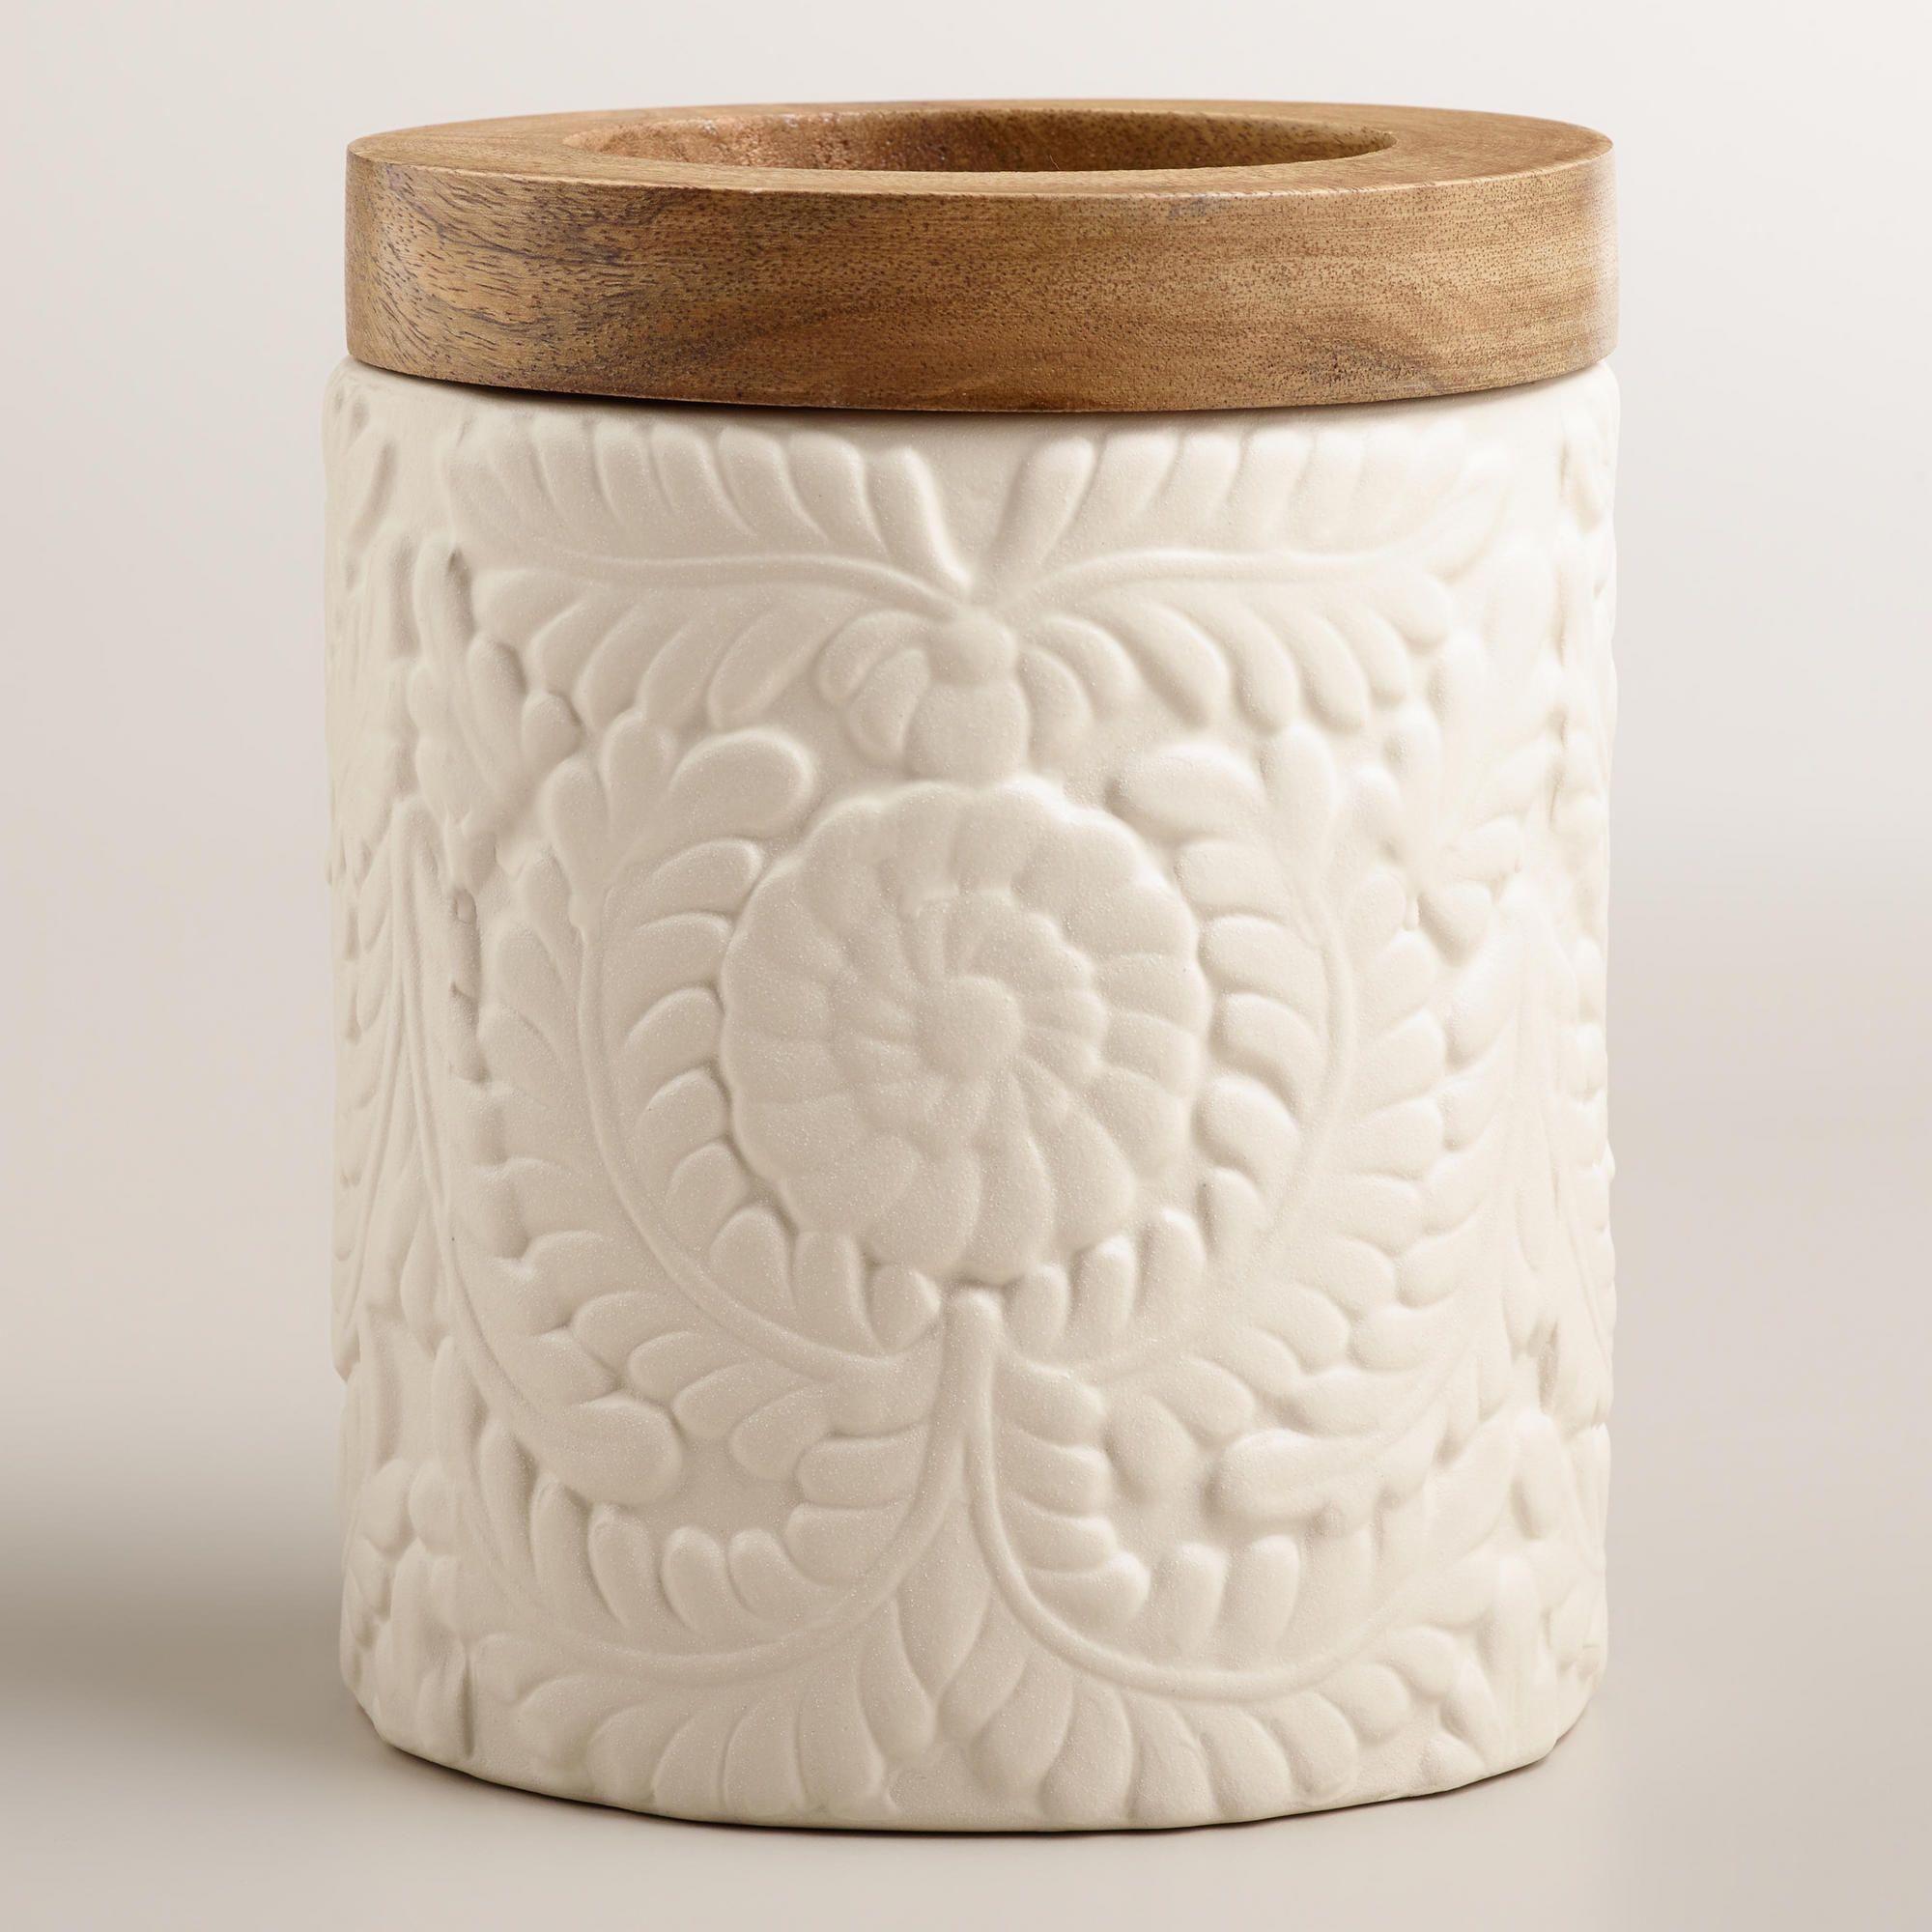 Matte Ivory Floral Utensil Crock Pottery Kitchen Utensil Crock Decor